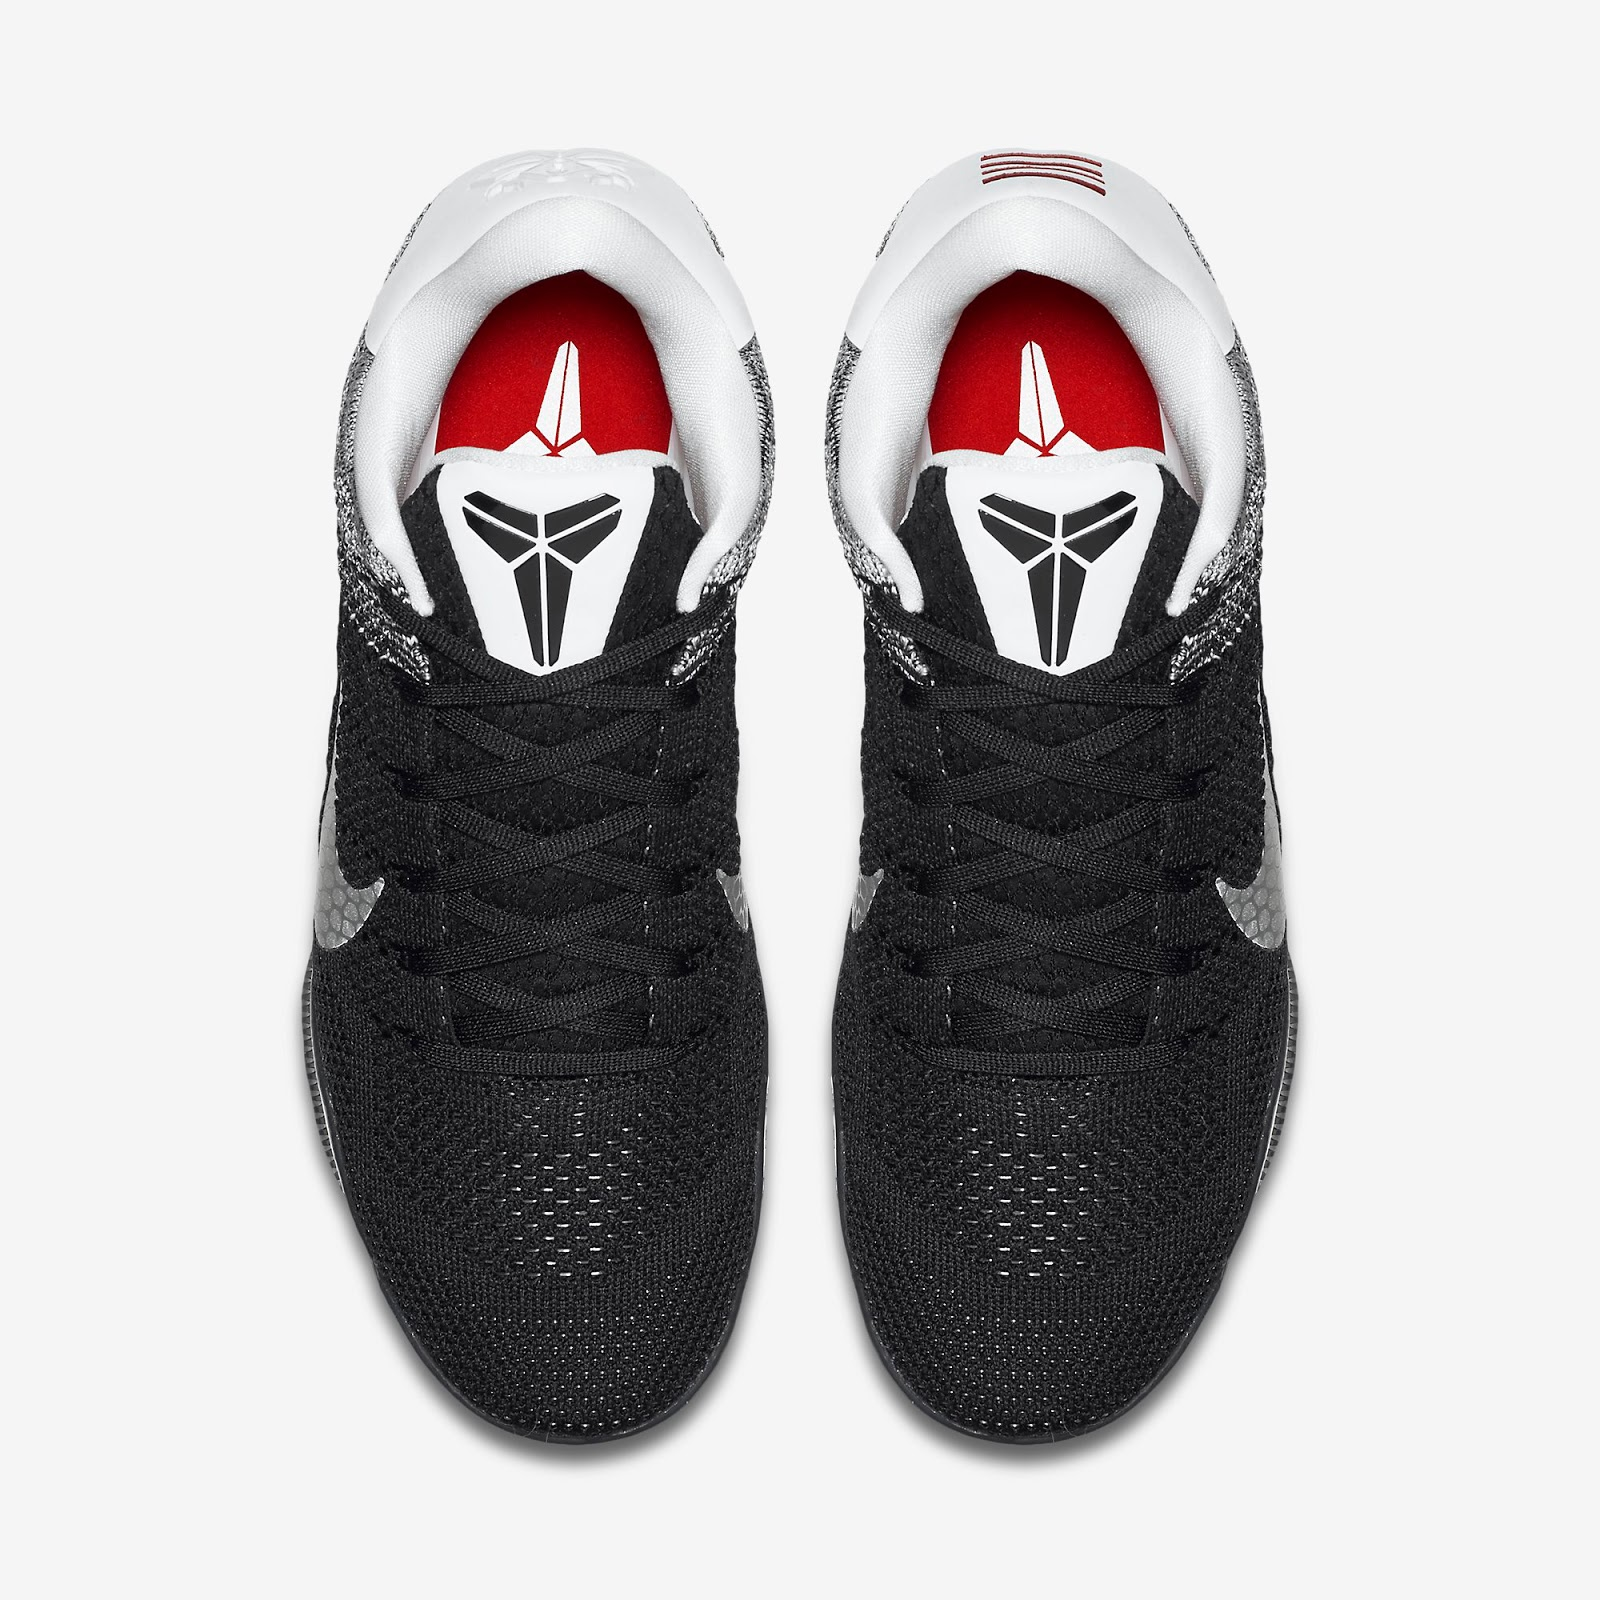 8ed71c37dbec ajordanxi Your  1 Source For Sneaker Release Dates  Nike Kobe 11 ...